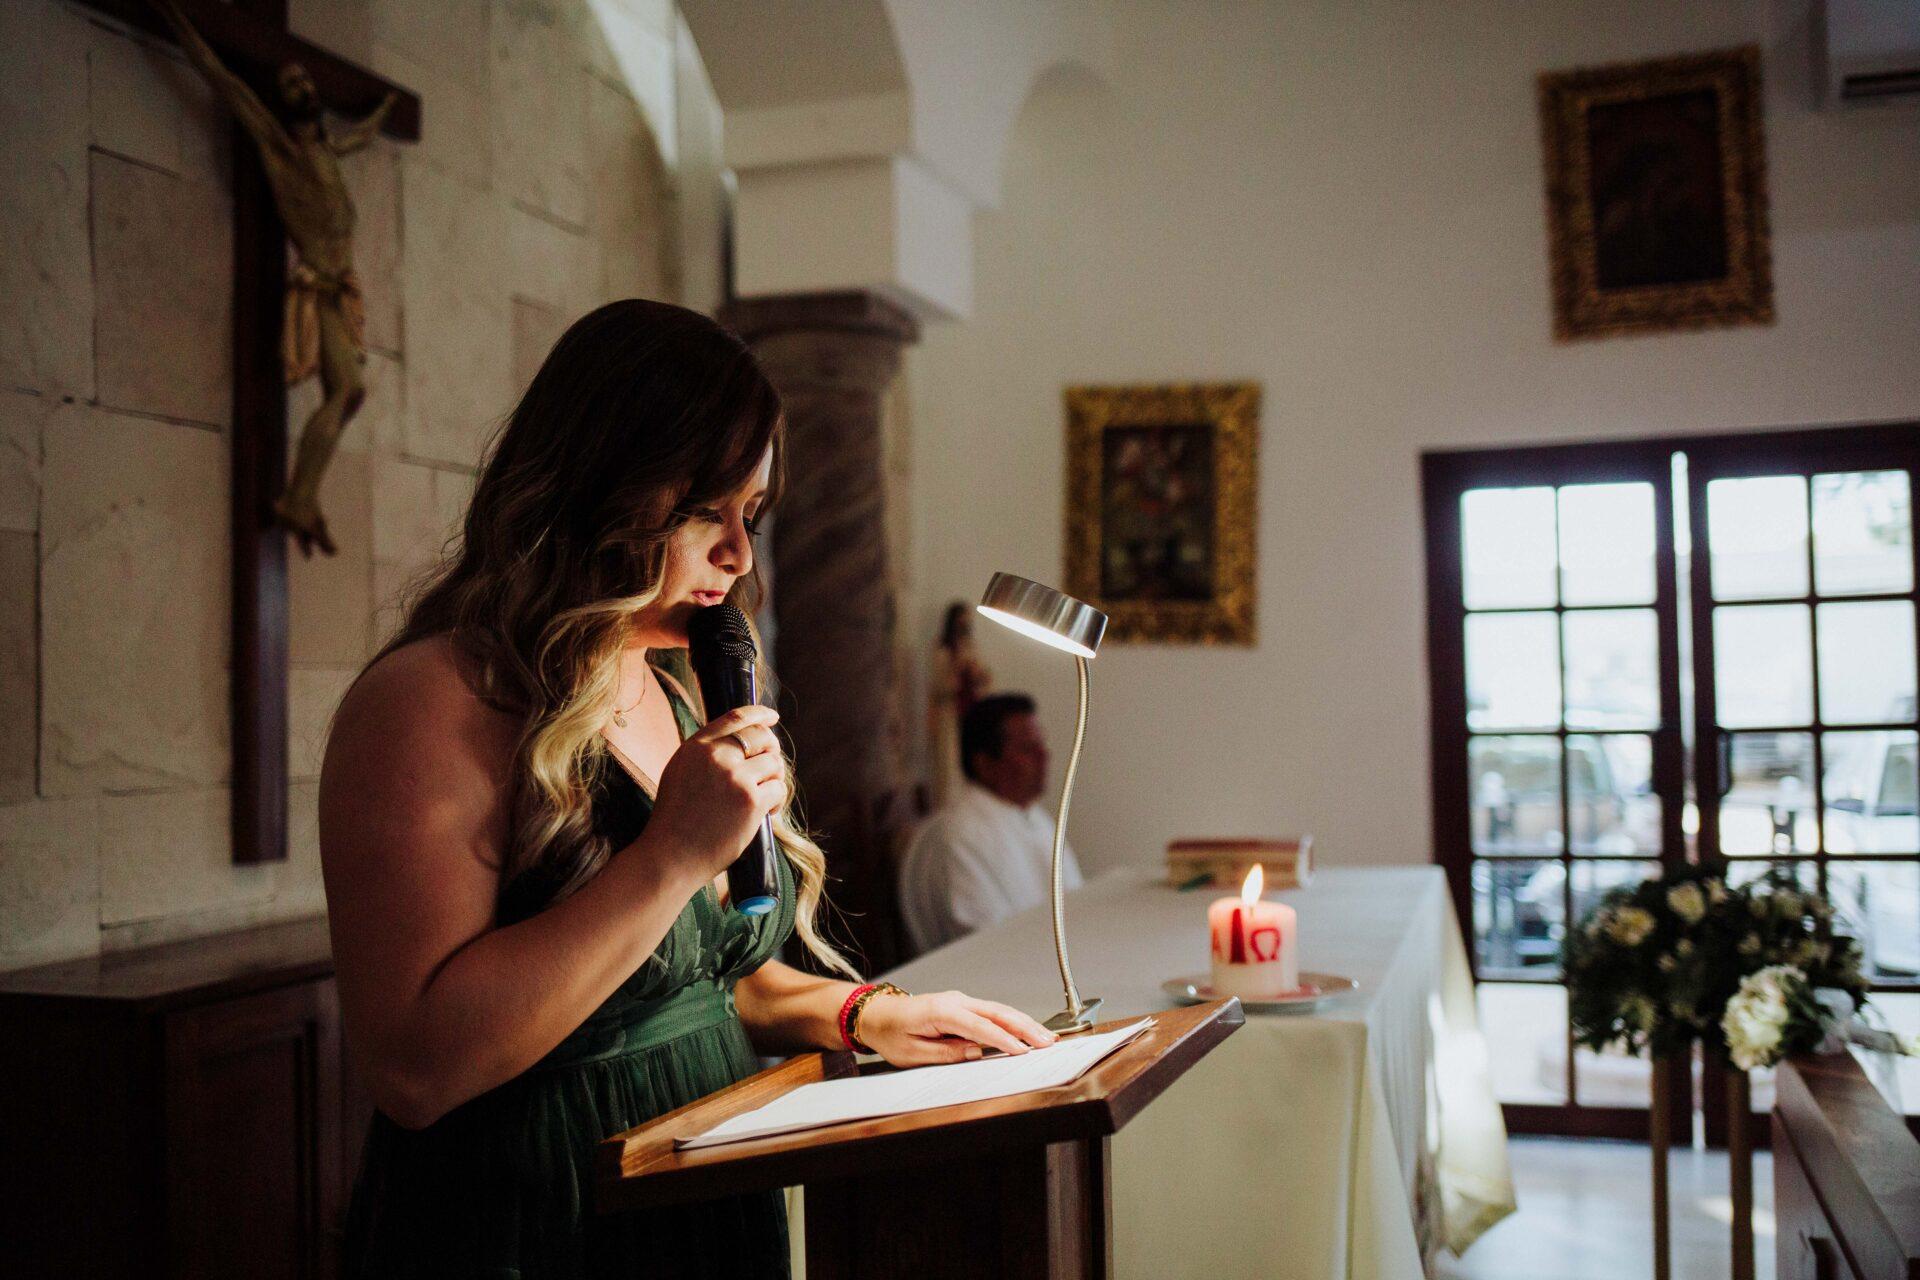 javier_noriega_fotografo_bodas_torreon_coahuila_zacatecas_wedding_photographer28a